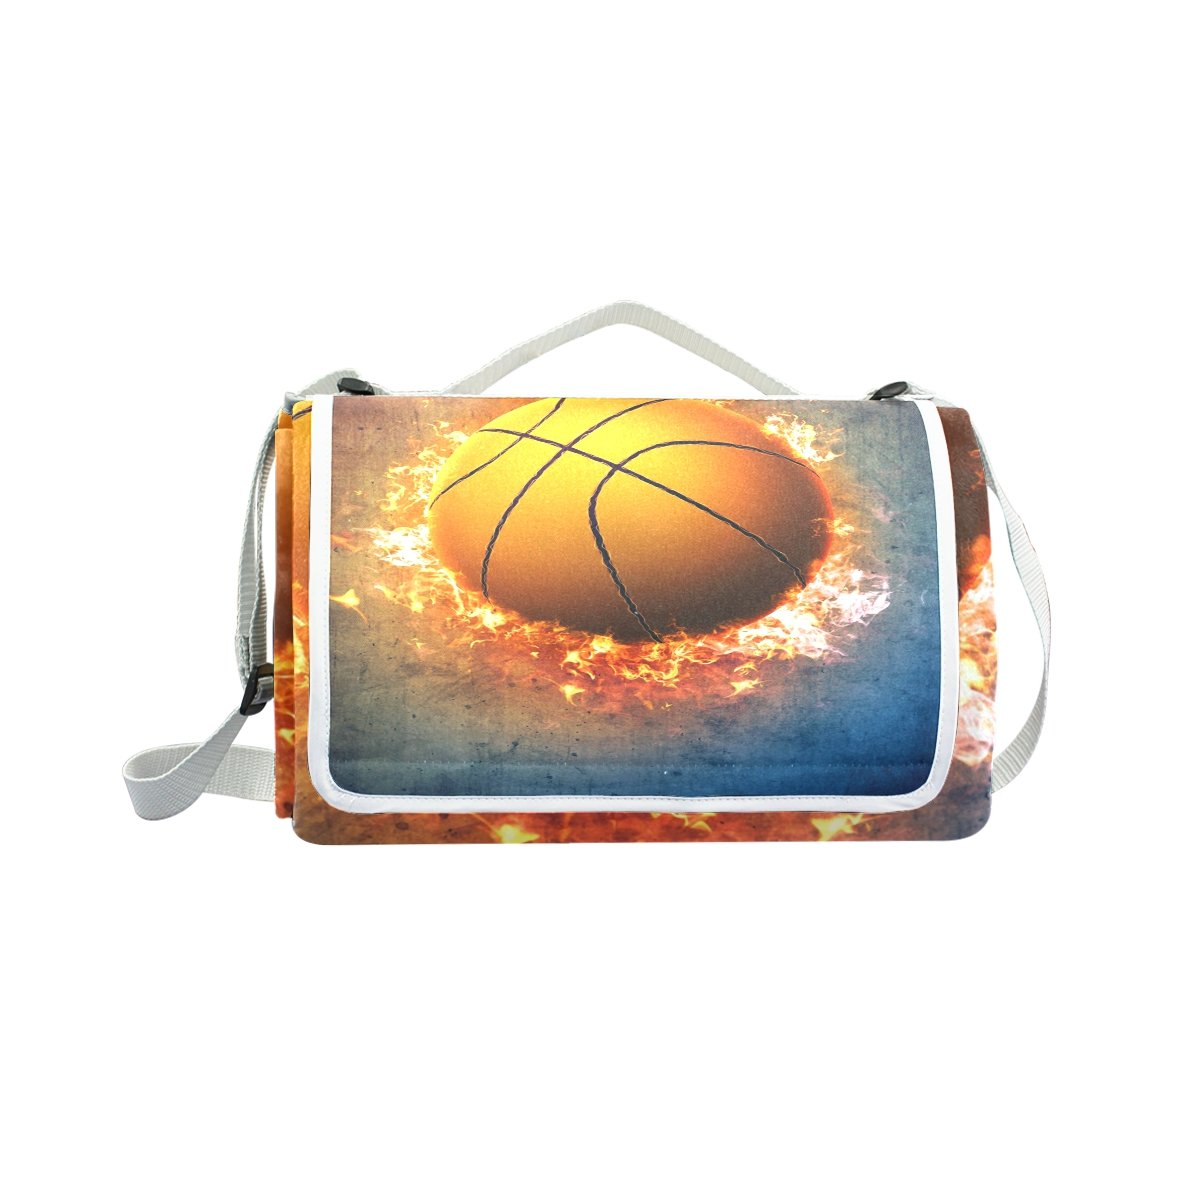 My Little Nest Outdoor Camping Picnic Beach Blanket Mat Basketball Lightweight Portable Folding Travel Pad 57'' x 59''